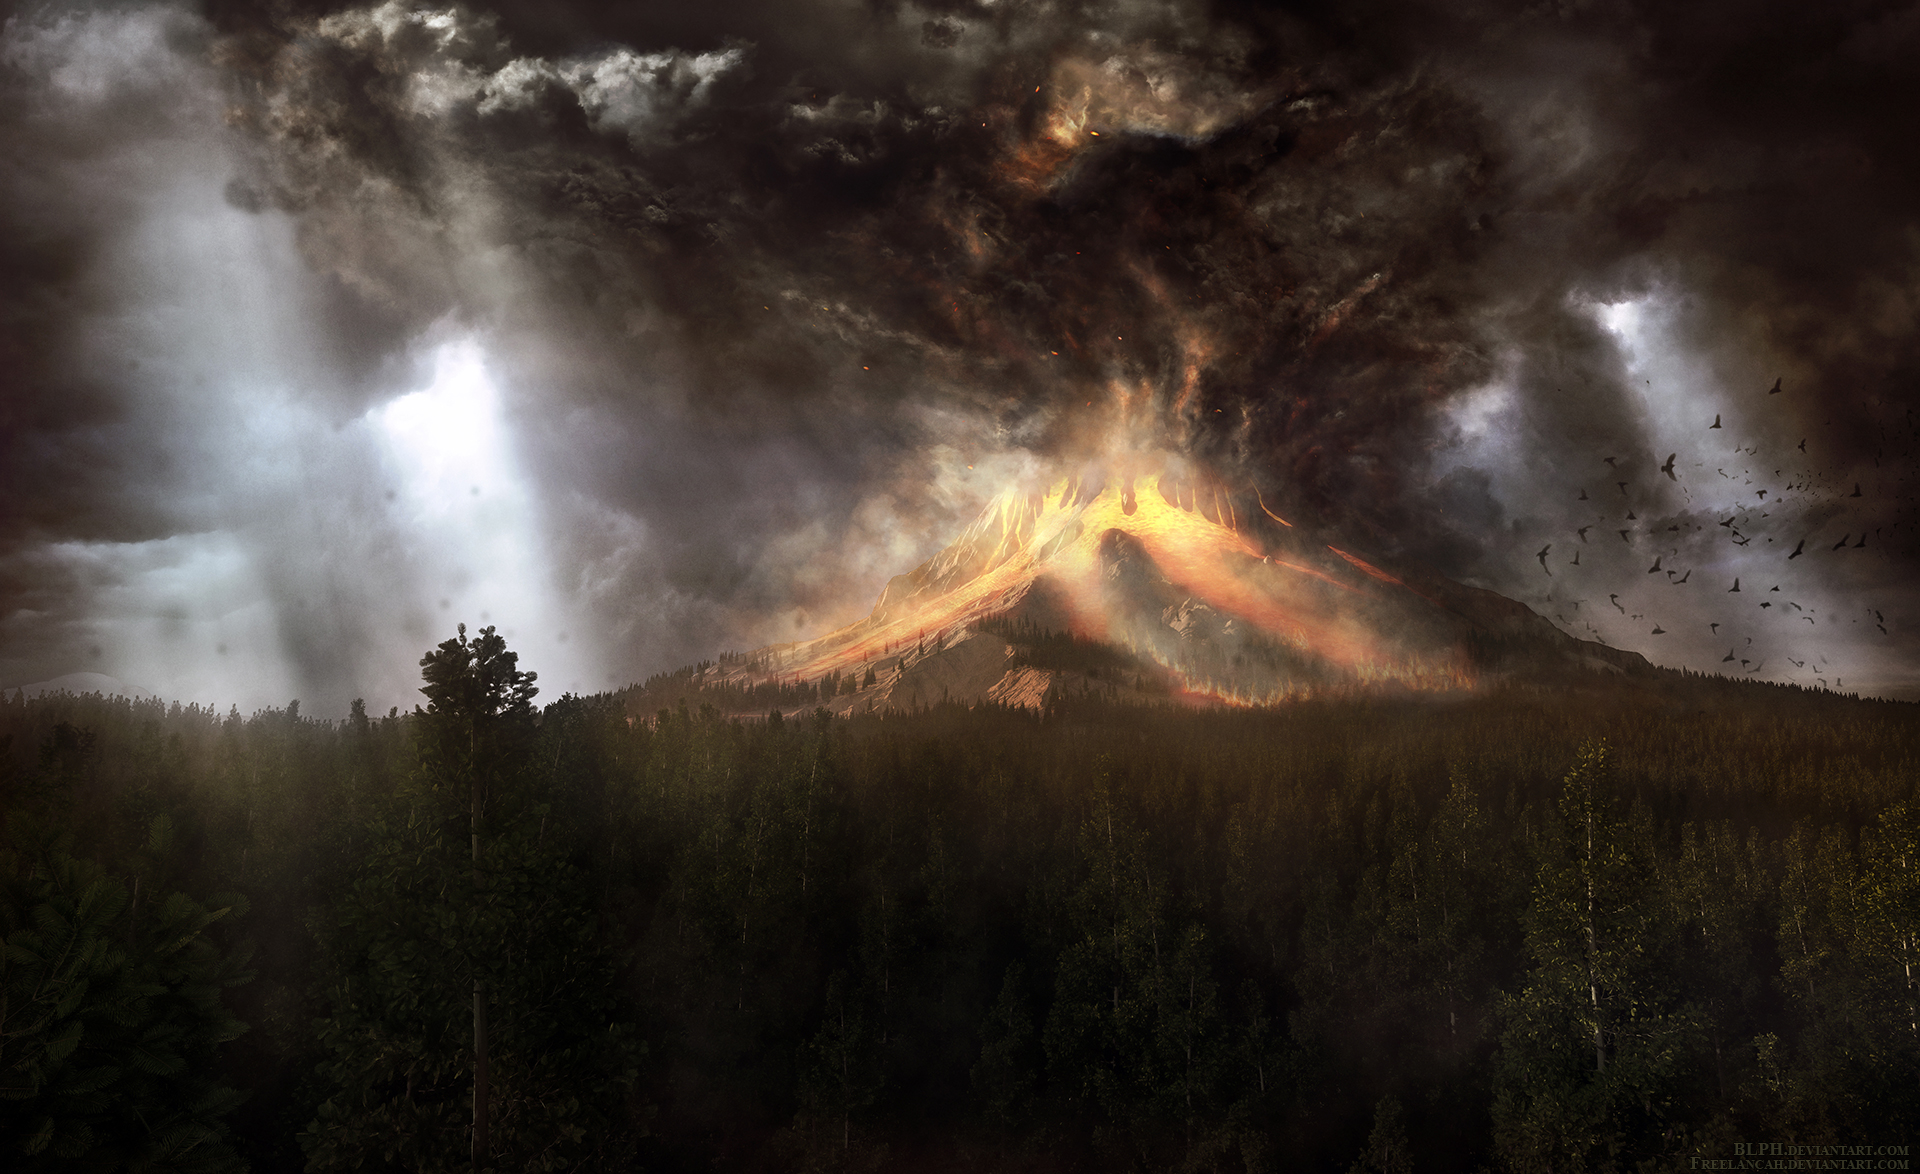 Under Burning Skies by BLPH